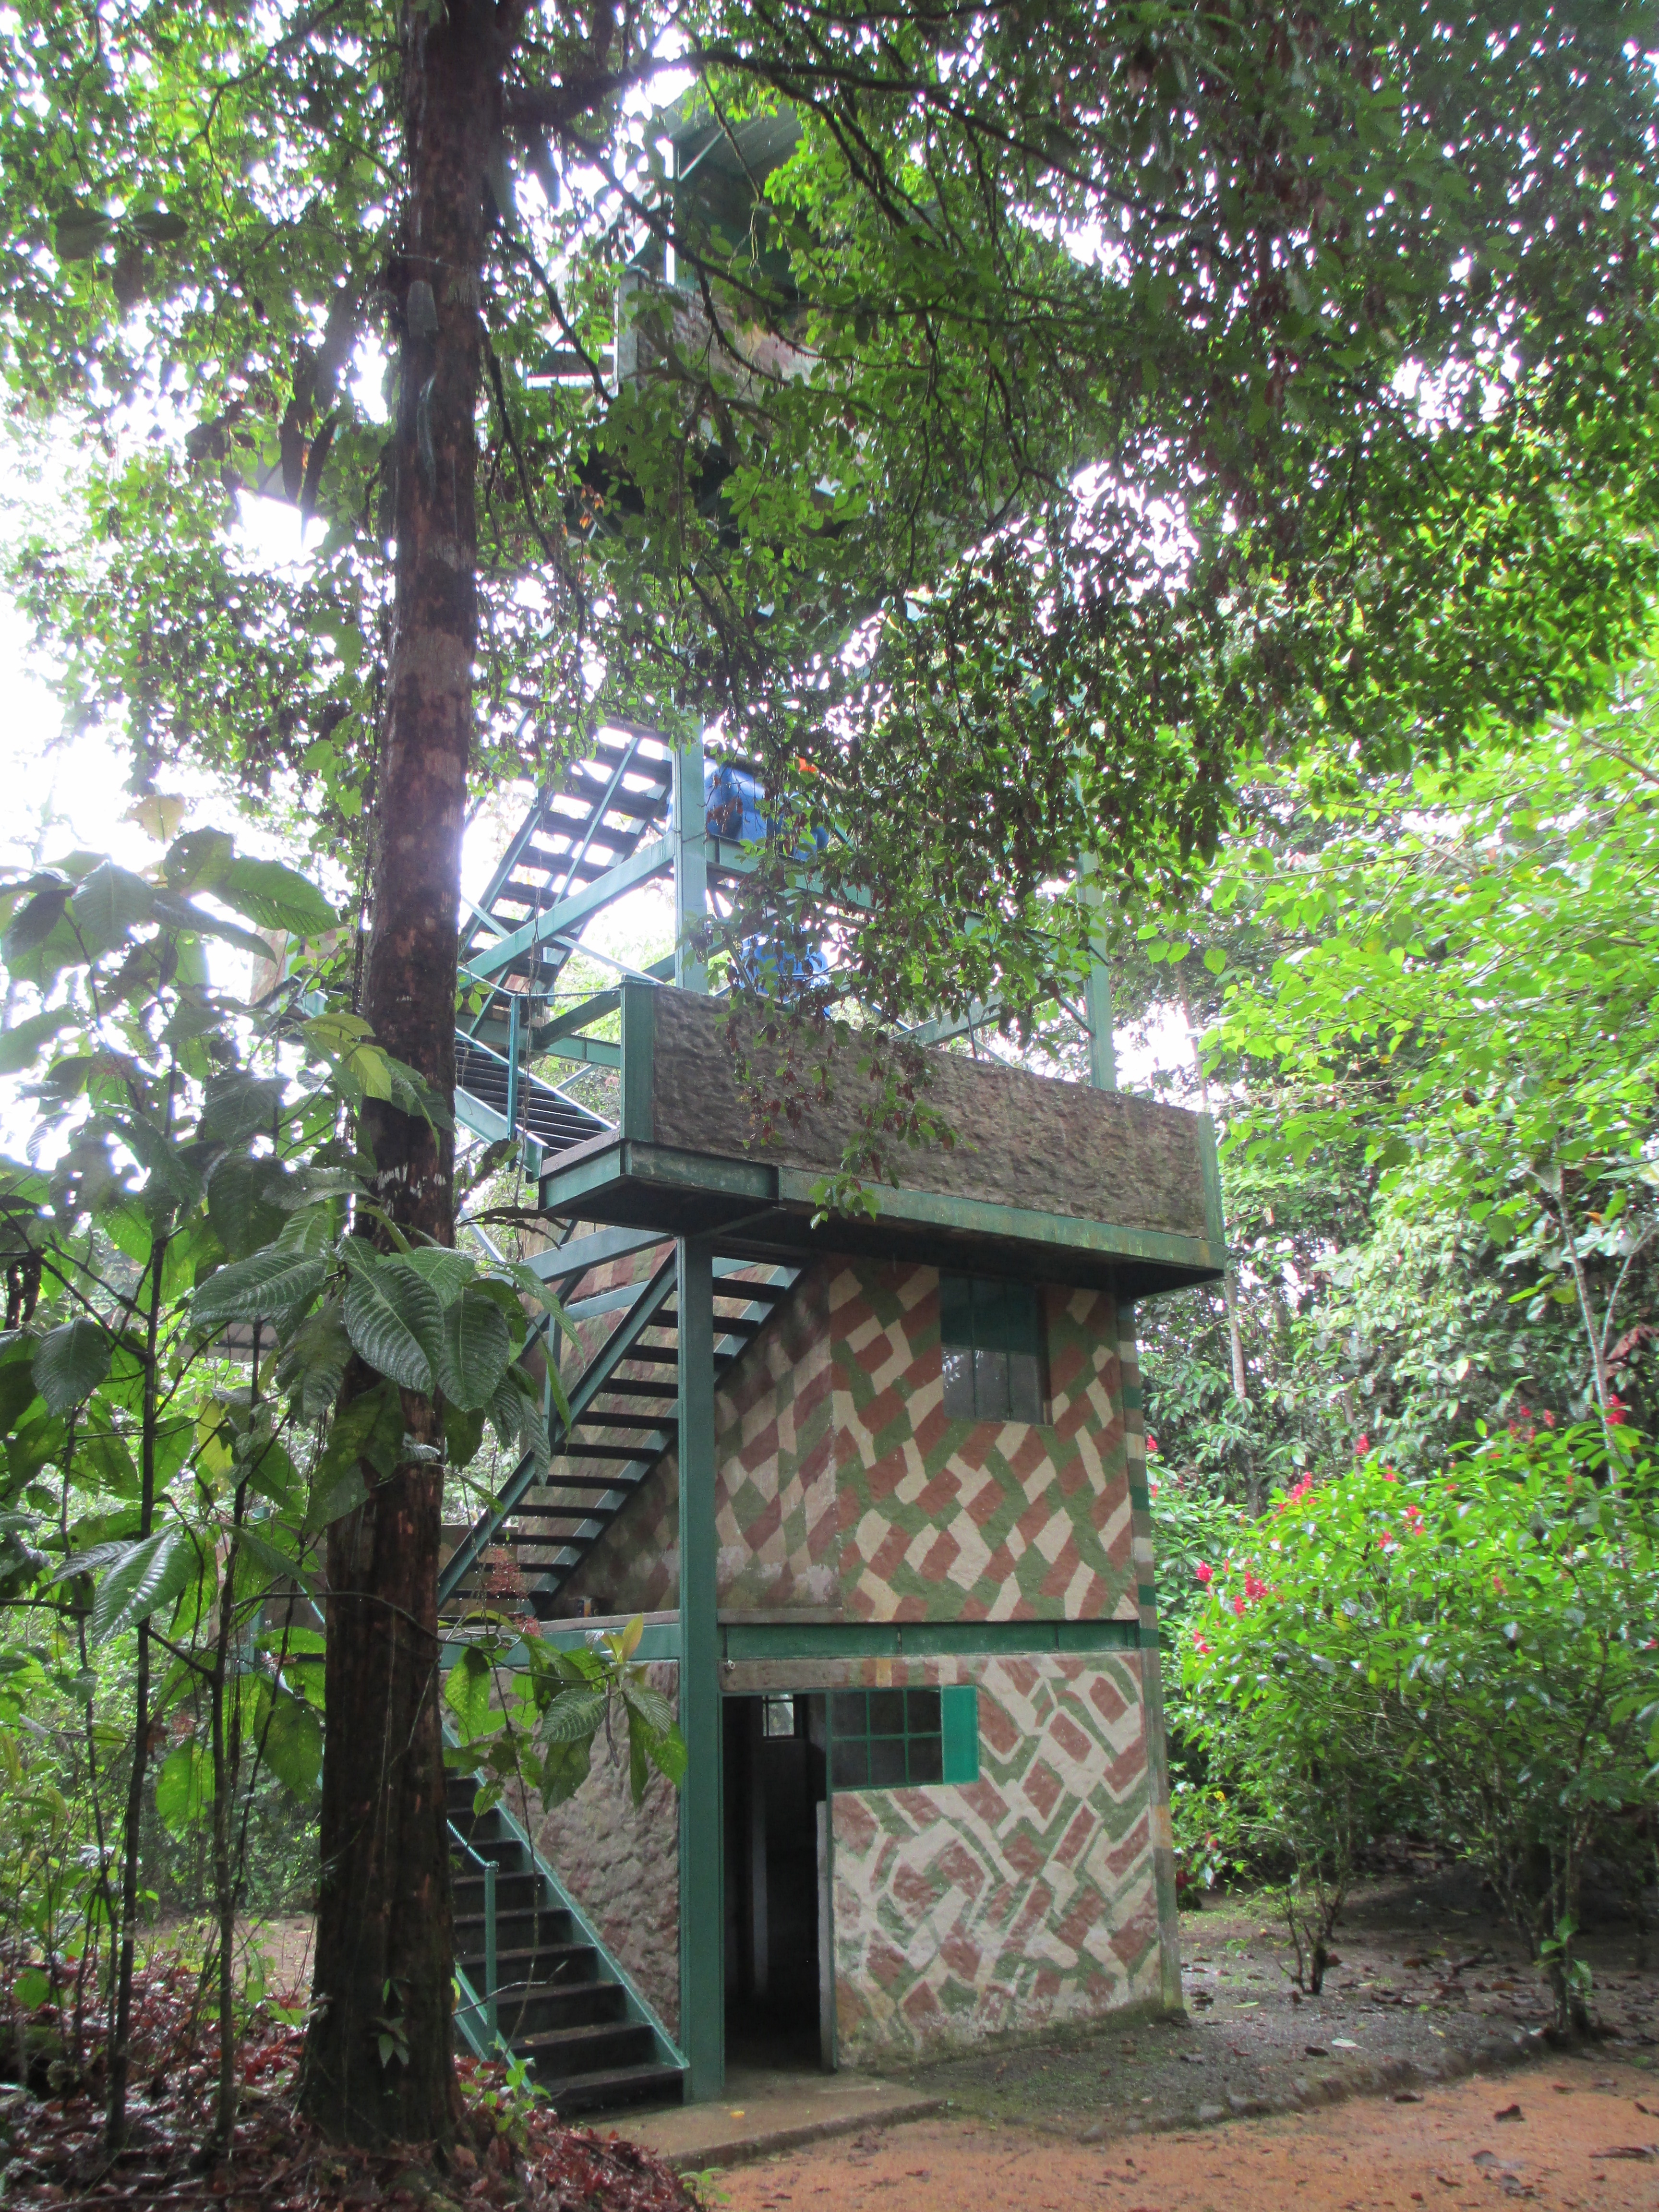 The tower at Rio Silanche